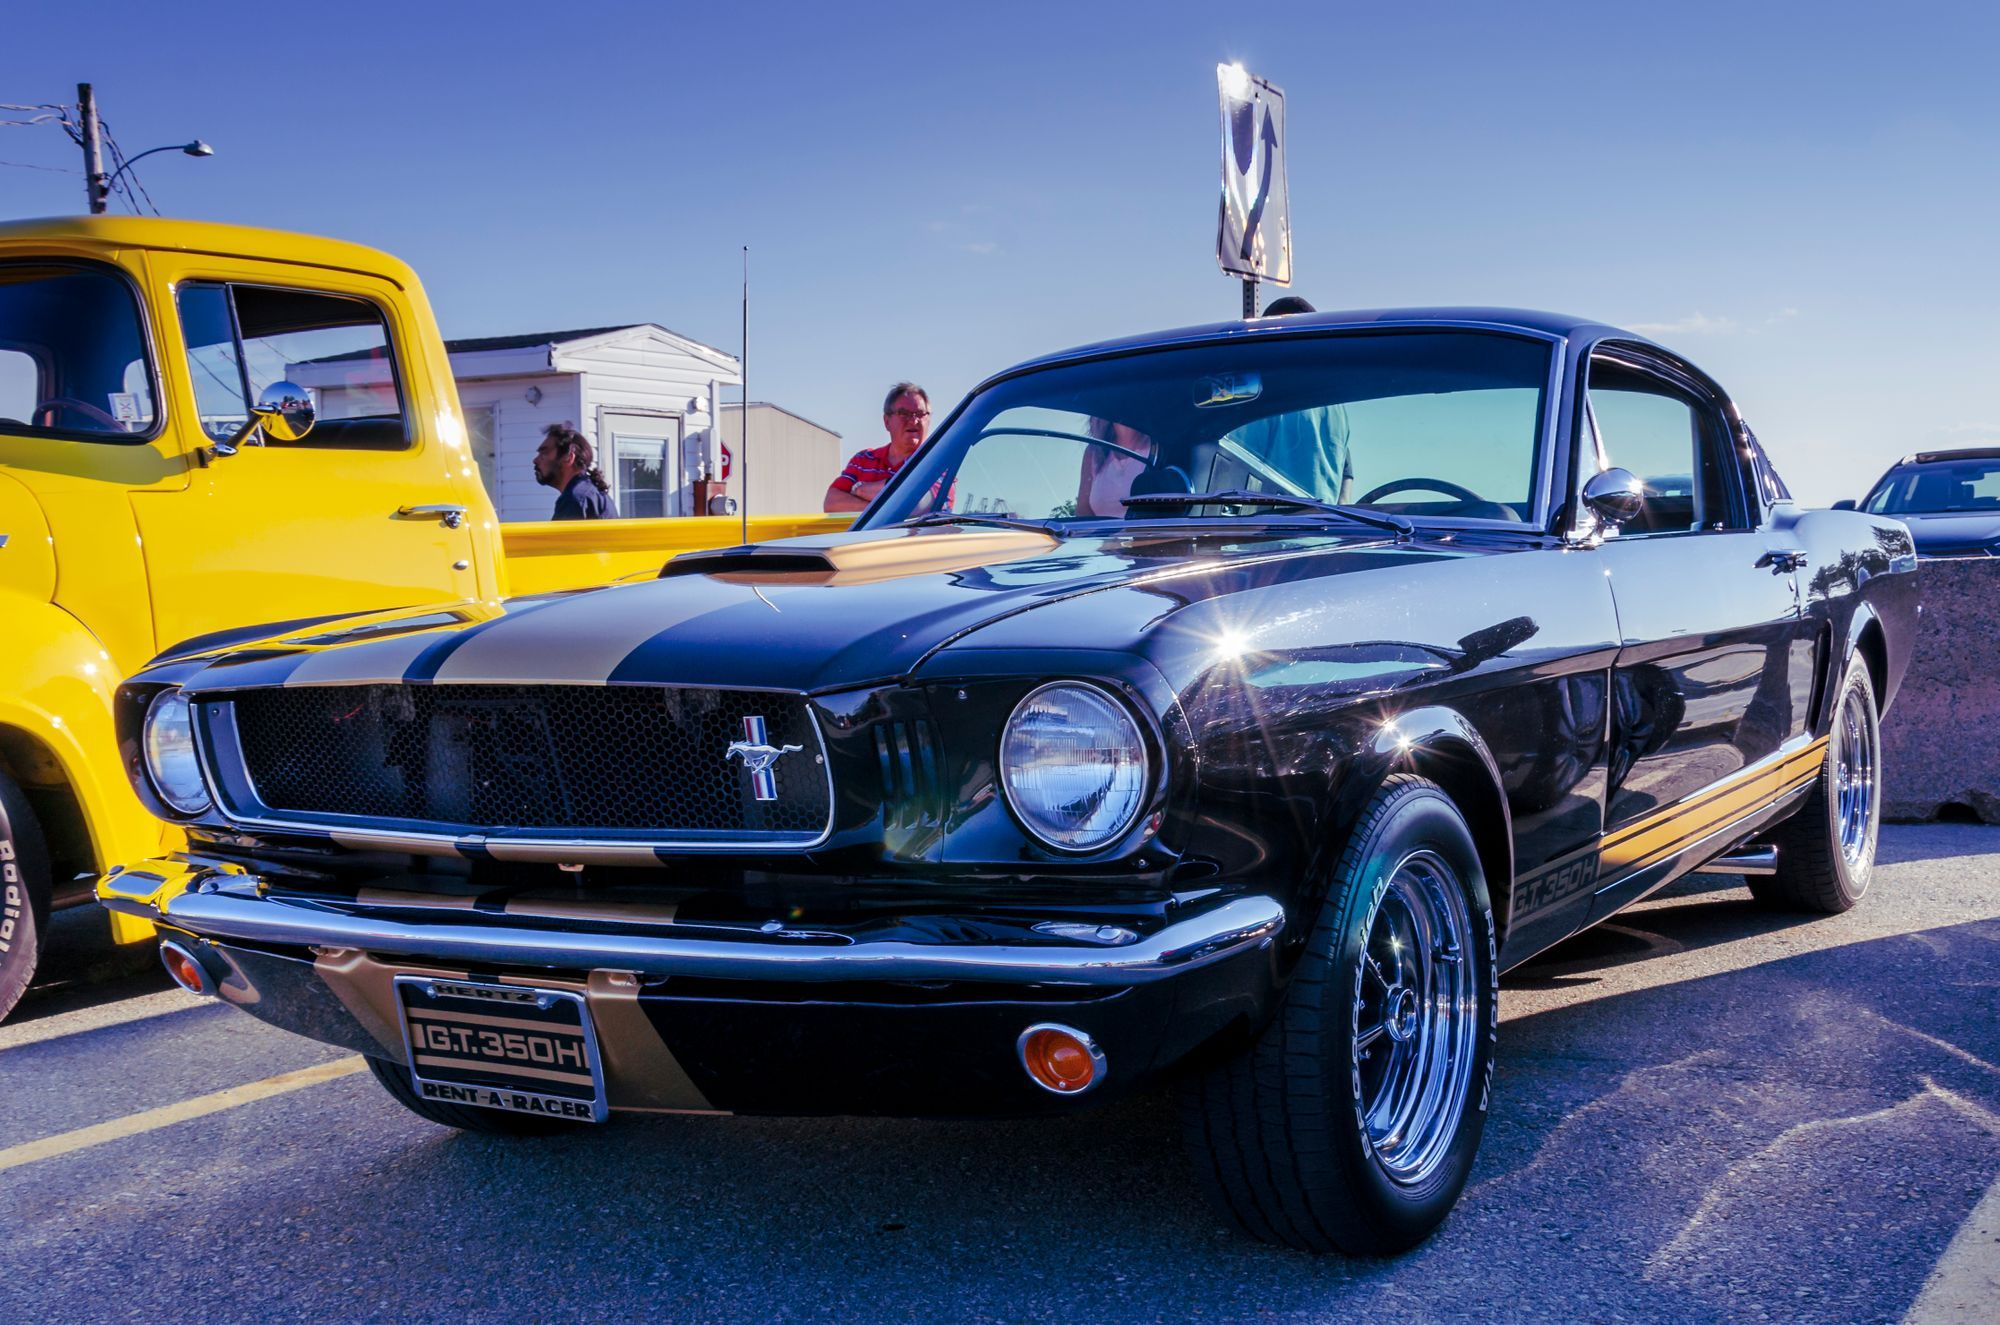 1966 Shelby Mustang Mustang Gt 350 Mustang Shelby Mustang Gt